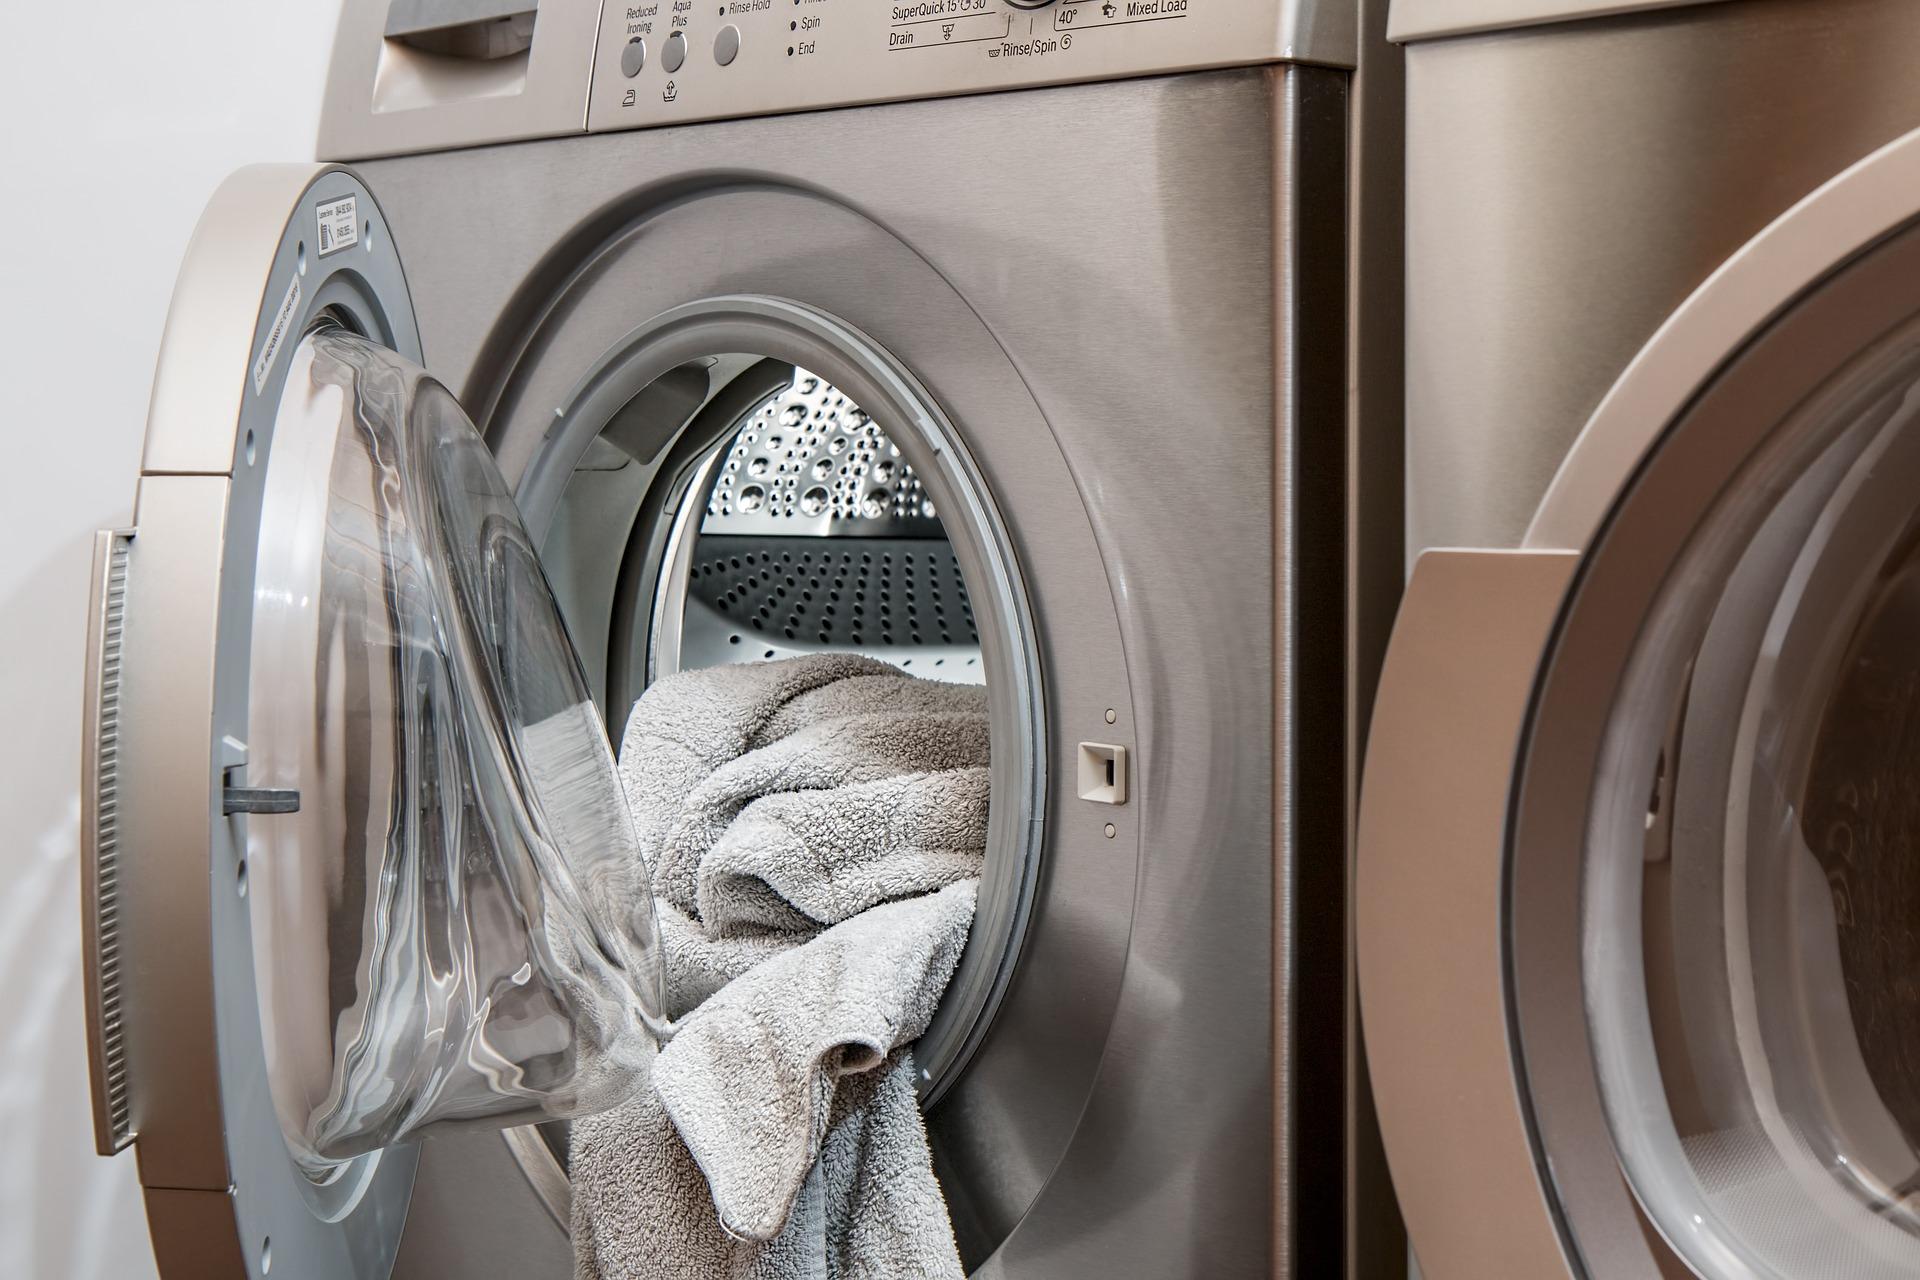 washing machine loaded but open